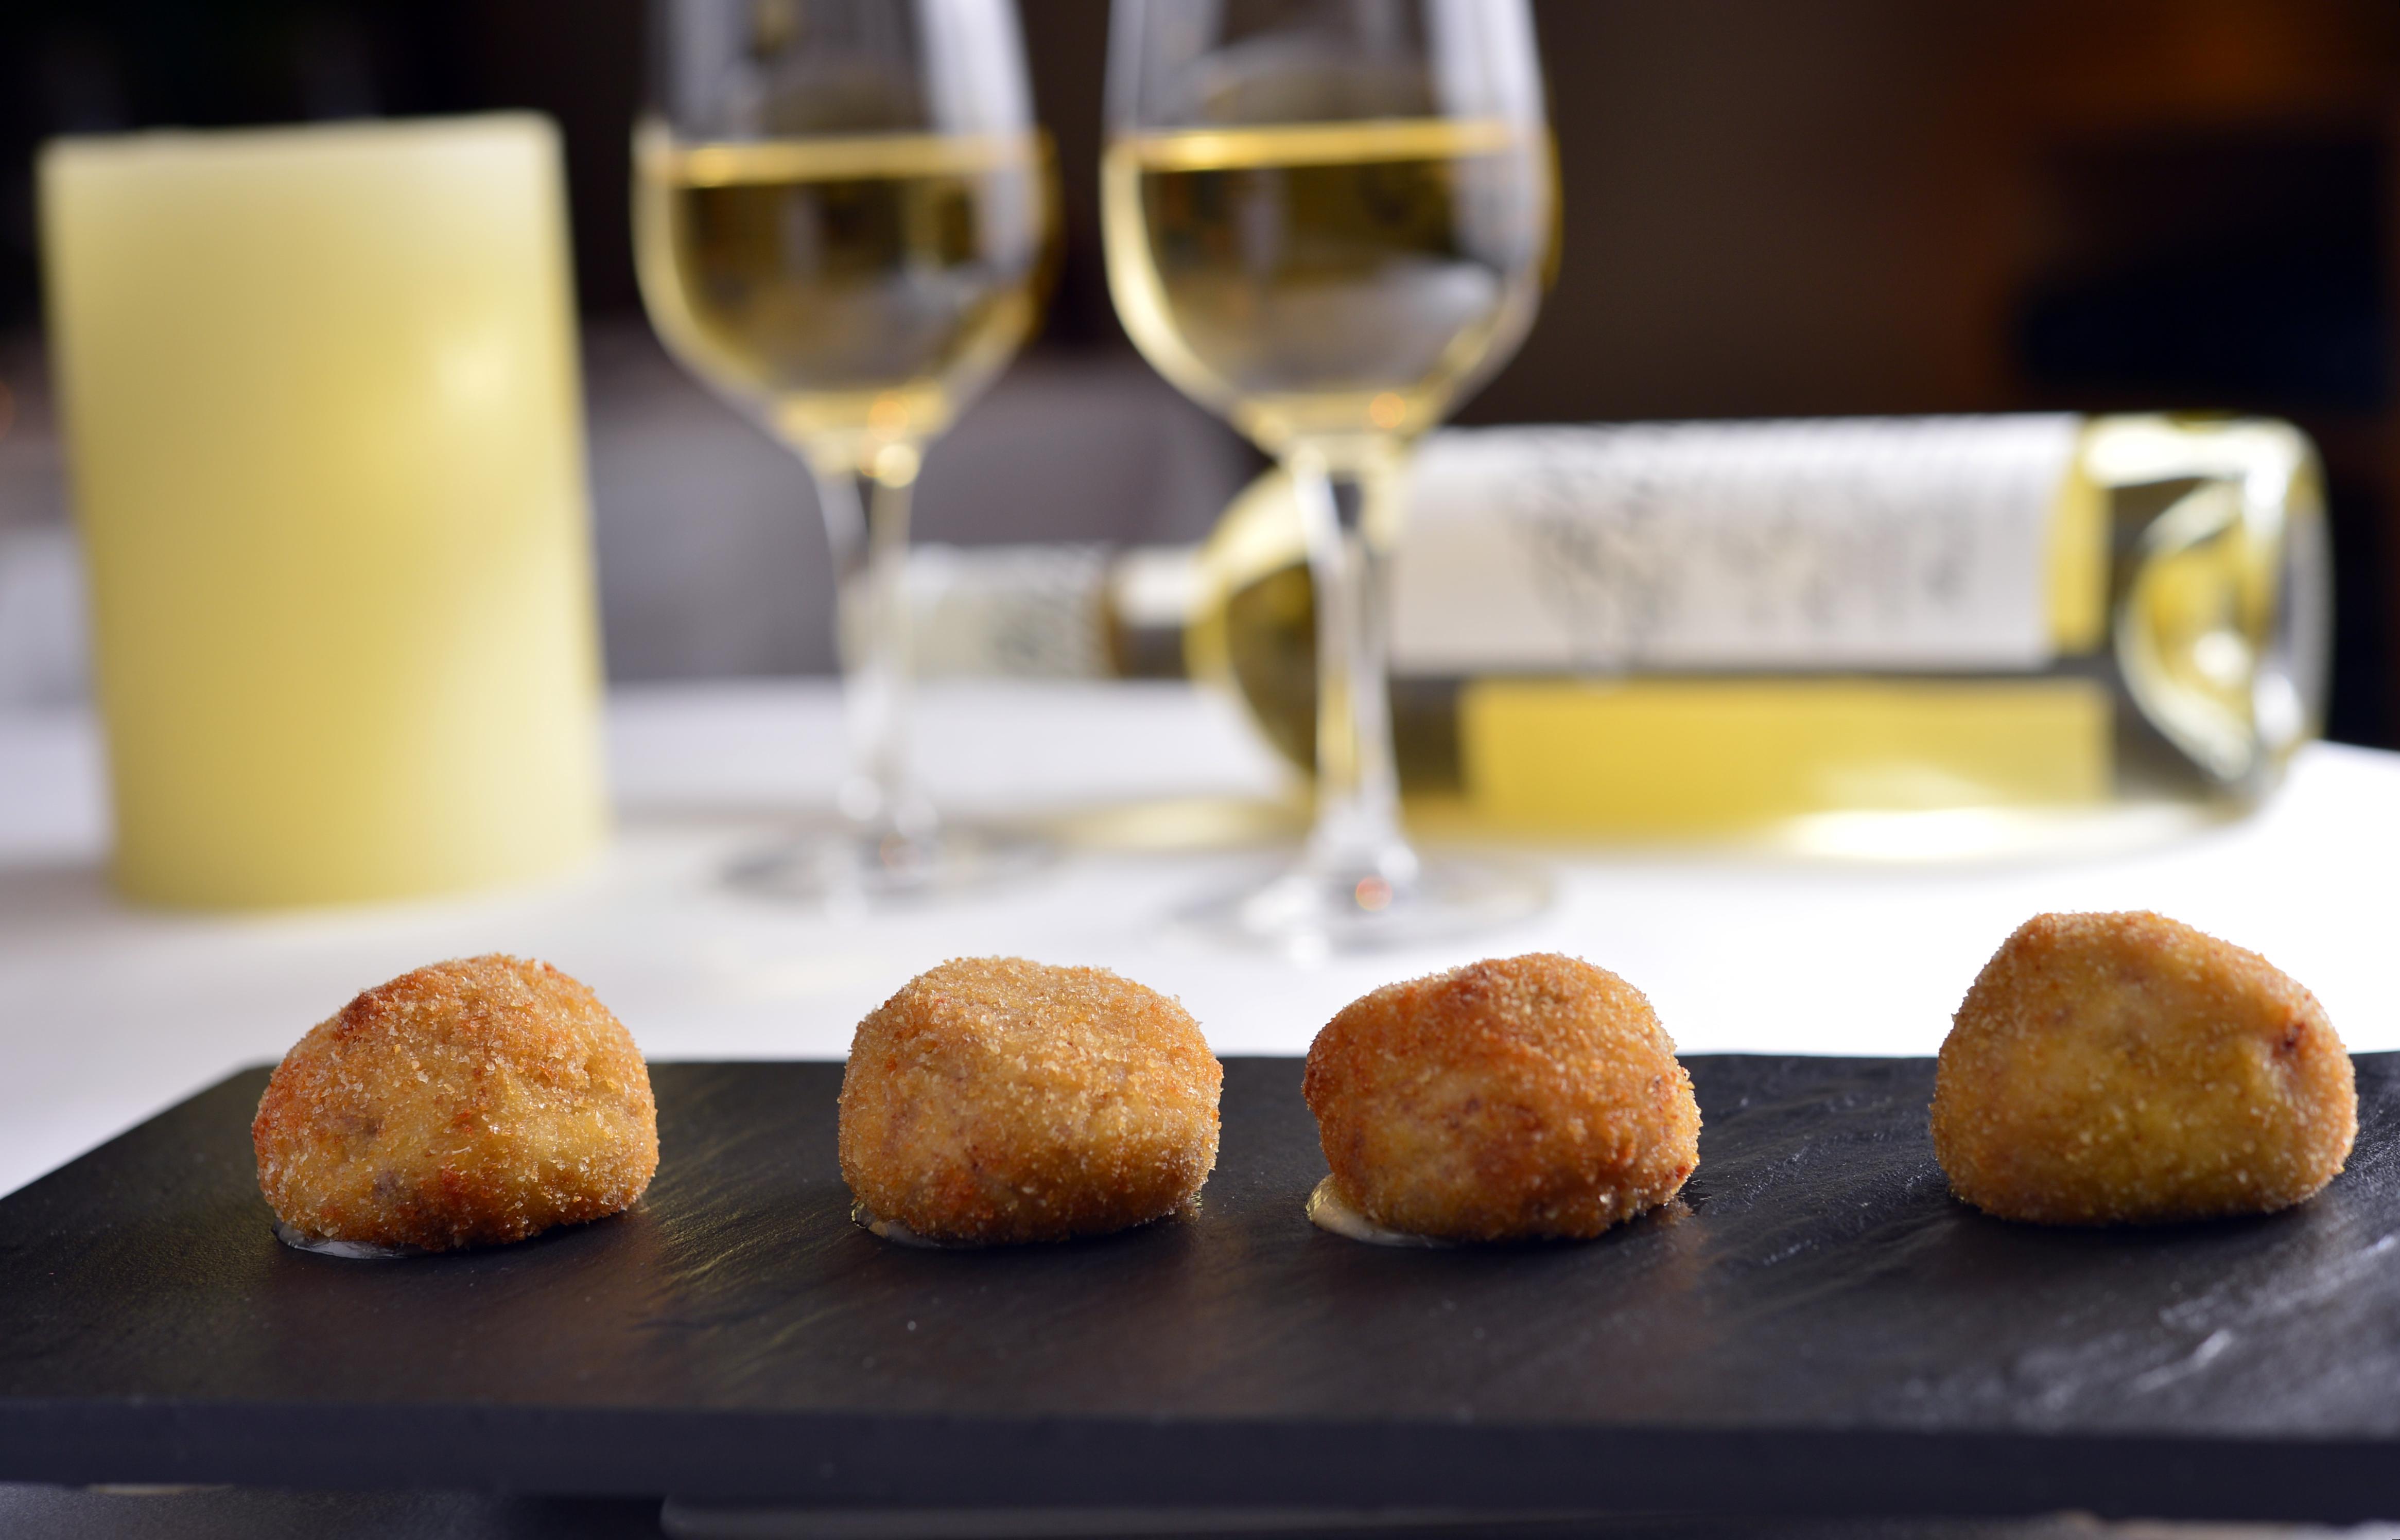 For Good Eating. Croqueta de Jamon, at Zelo Spanish restaurant & tapas bar. 01MAR13